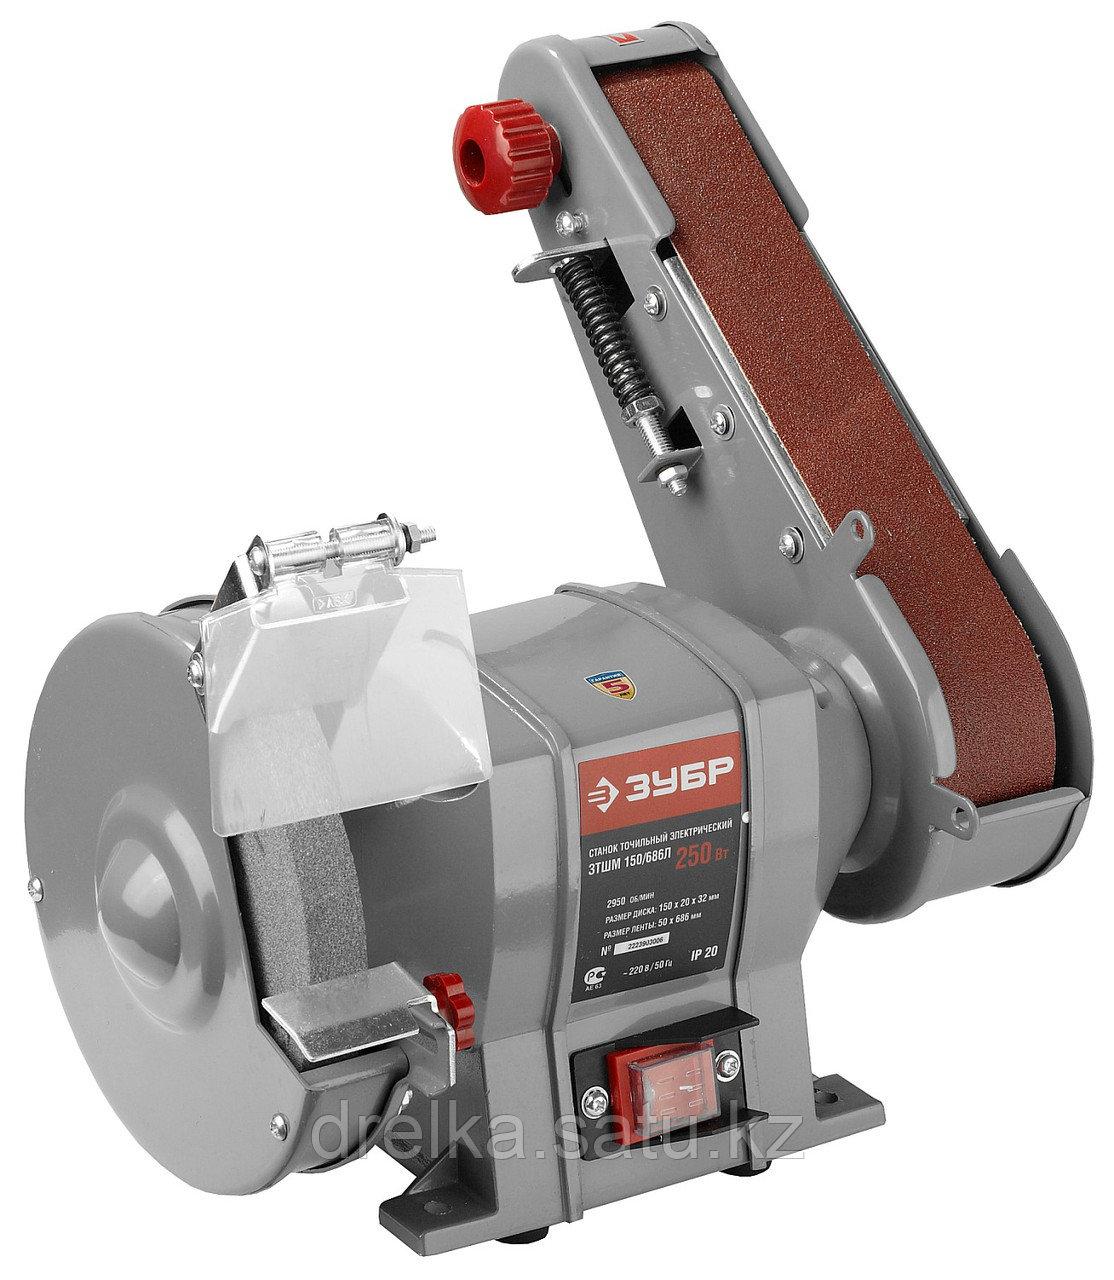 Станок точильный ЗУБР ЗТШМ-150/686Л, диск 150 х 20 х 32 мм, лента 50 х 686 мм, 2950 об/мин, 250 Вт.